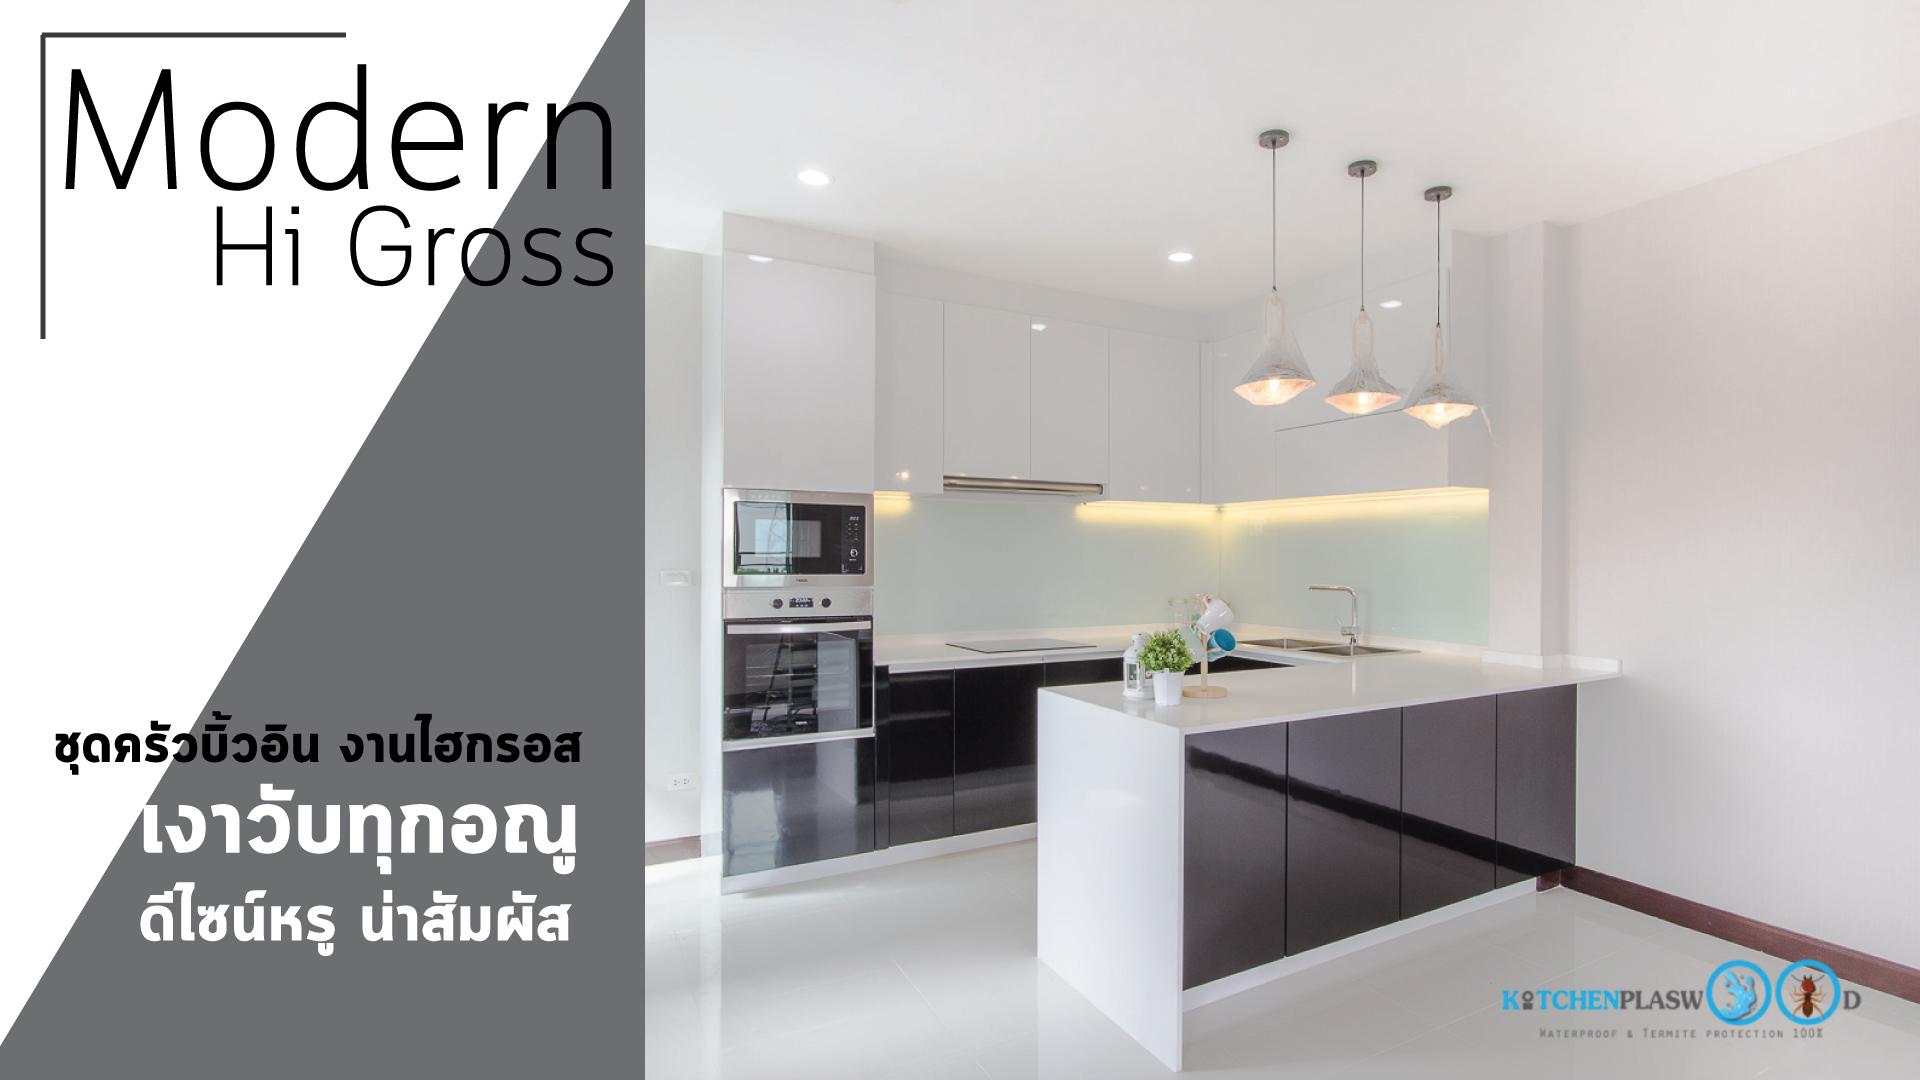 Modern Kitchen, Hi gross, Black and White Tone,